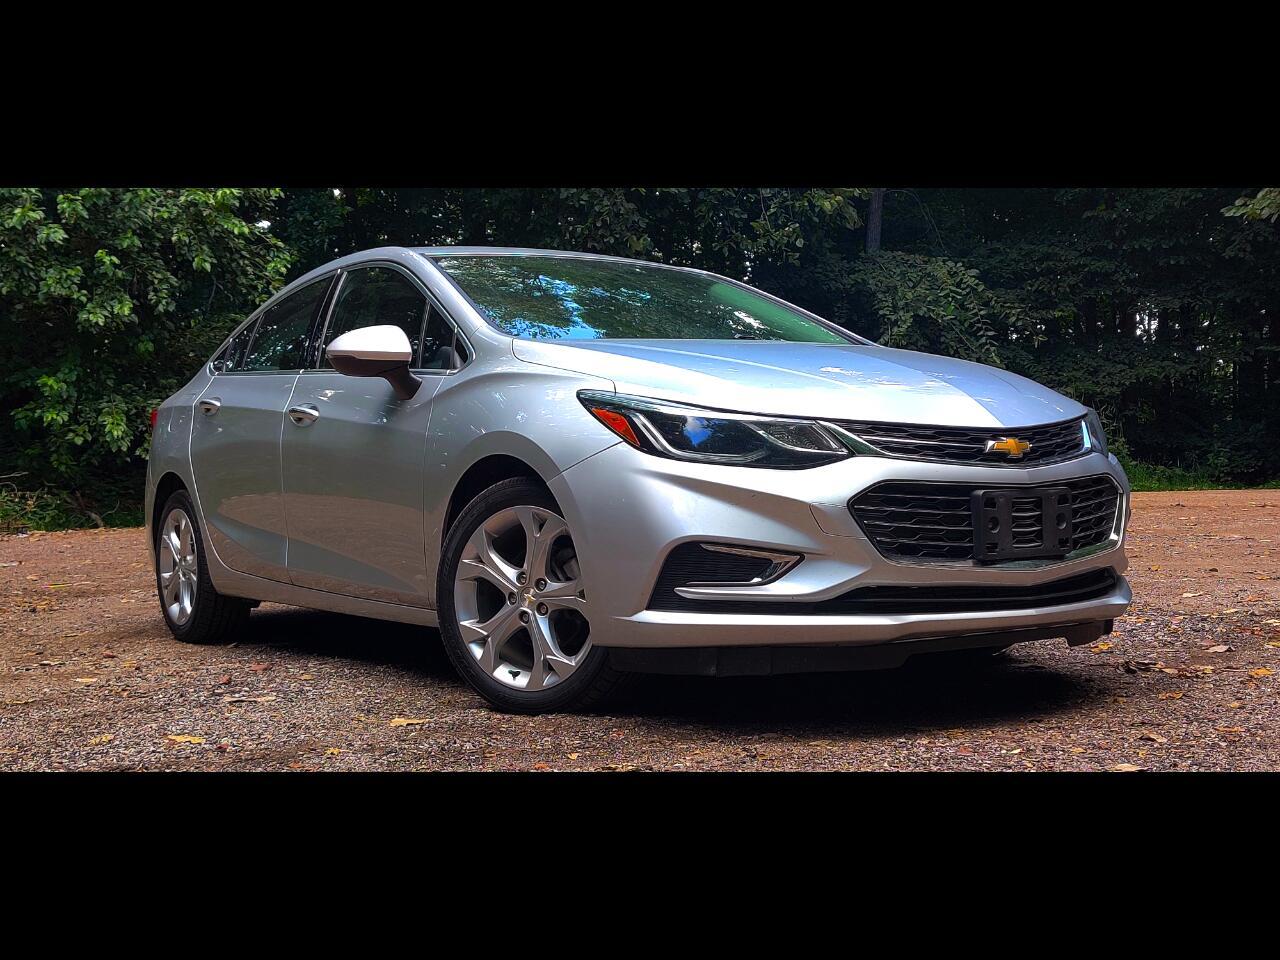 2017 Chevrolet Cruze 4DR SDN 1.4L PREMIER W/1S